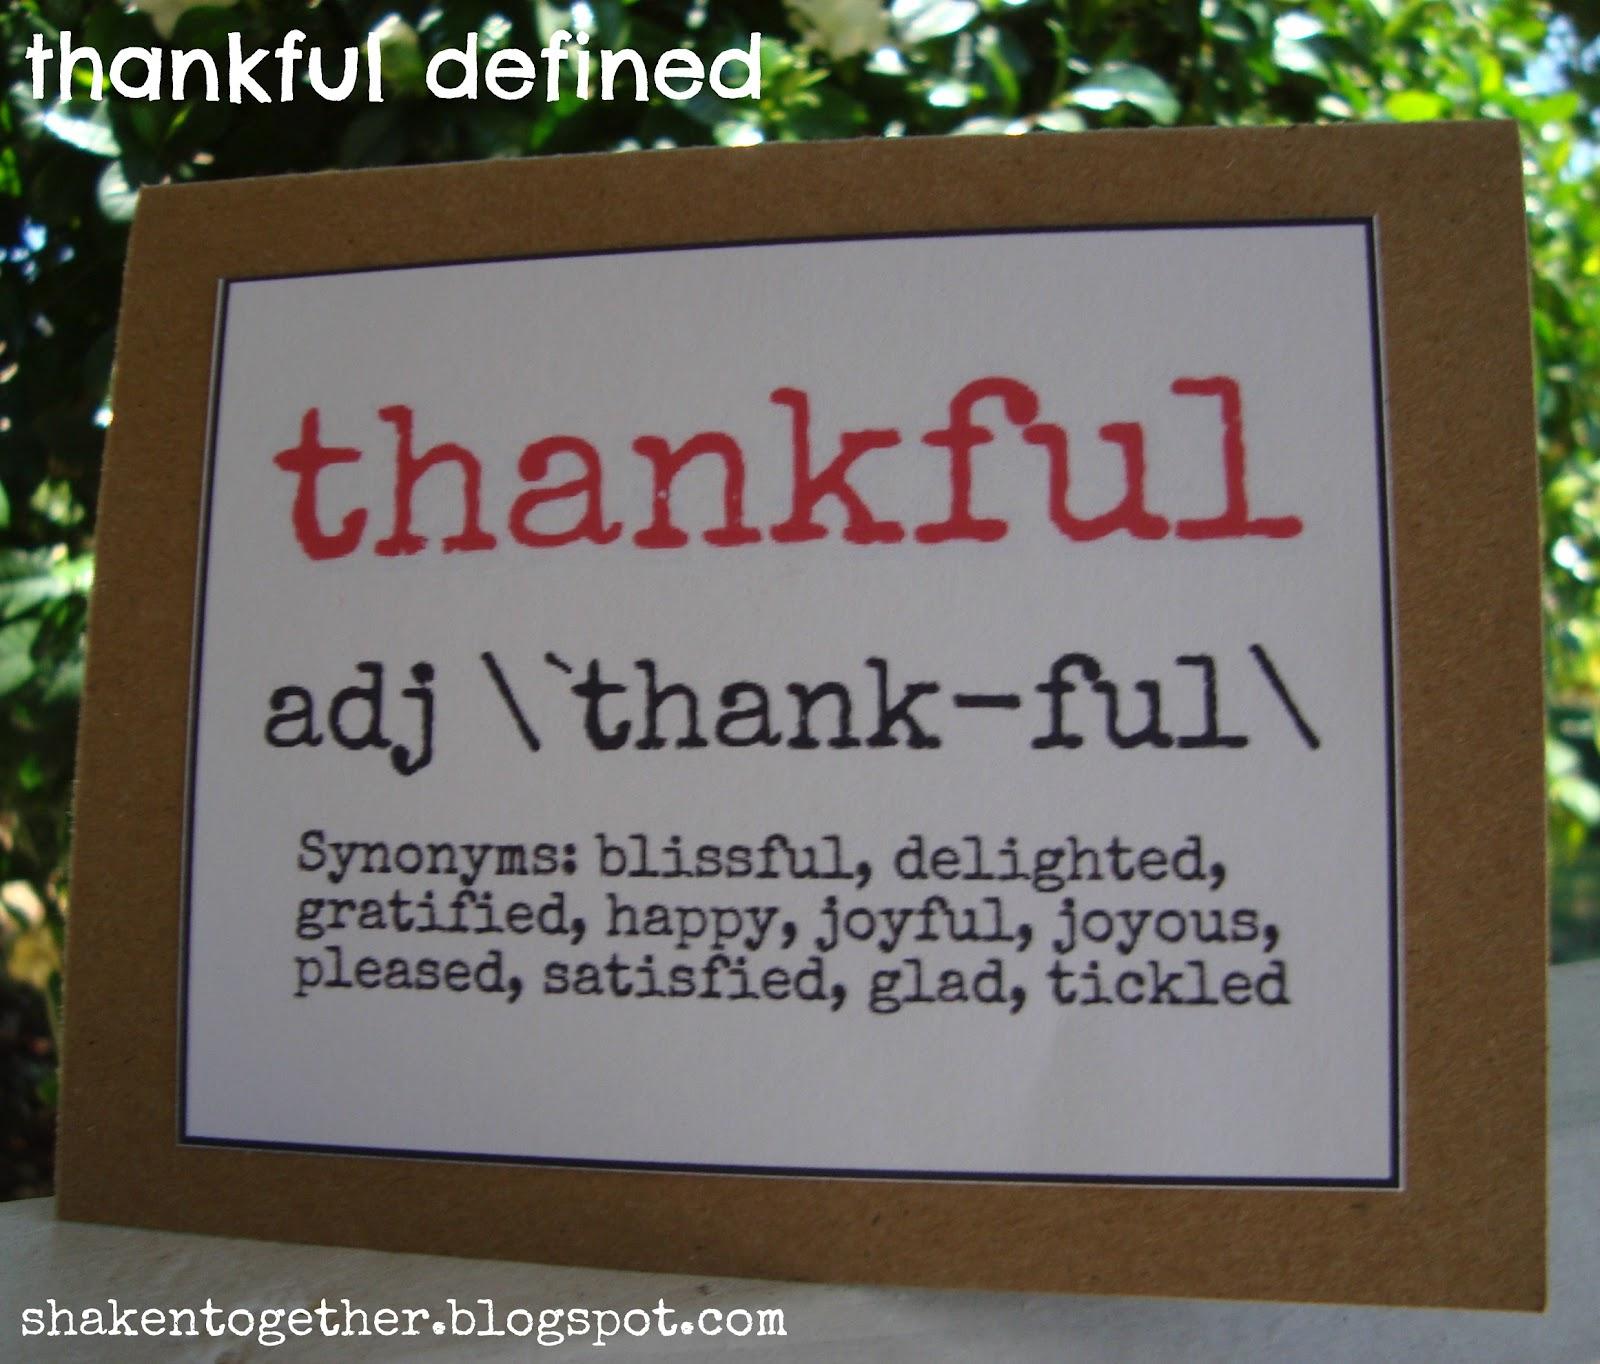 Free Printable Teacher Thank You Cards - Shaken Together - Free Printable Volunteer Thank You Cards